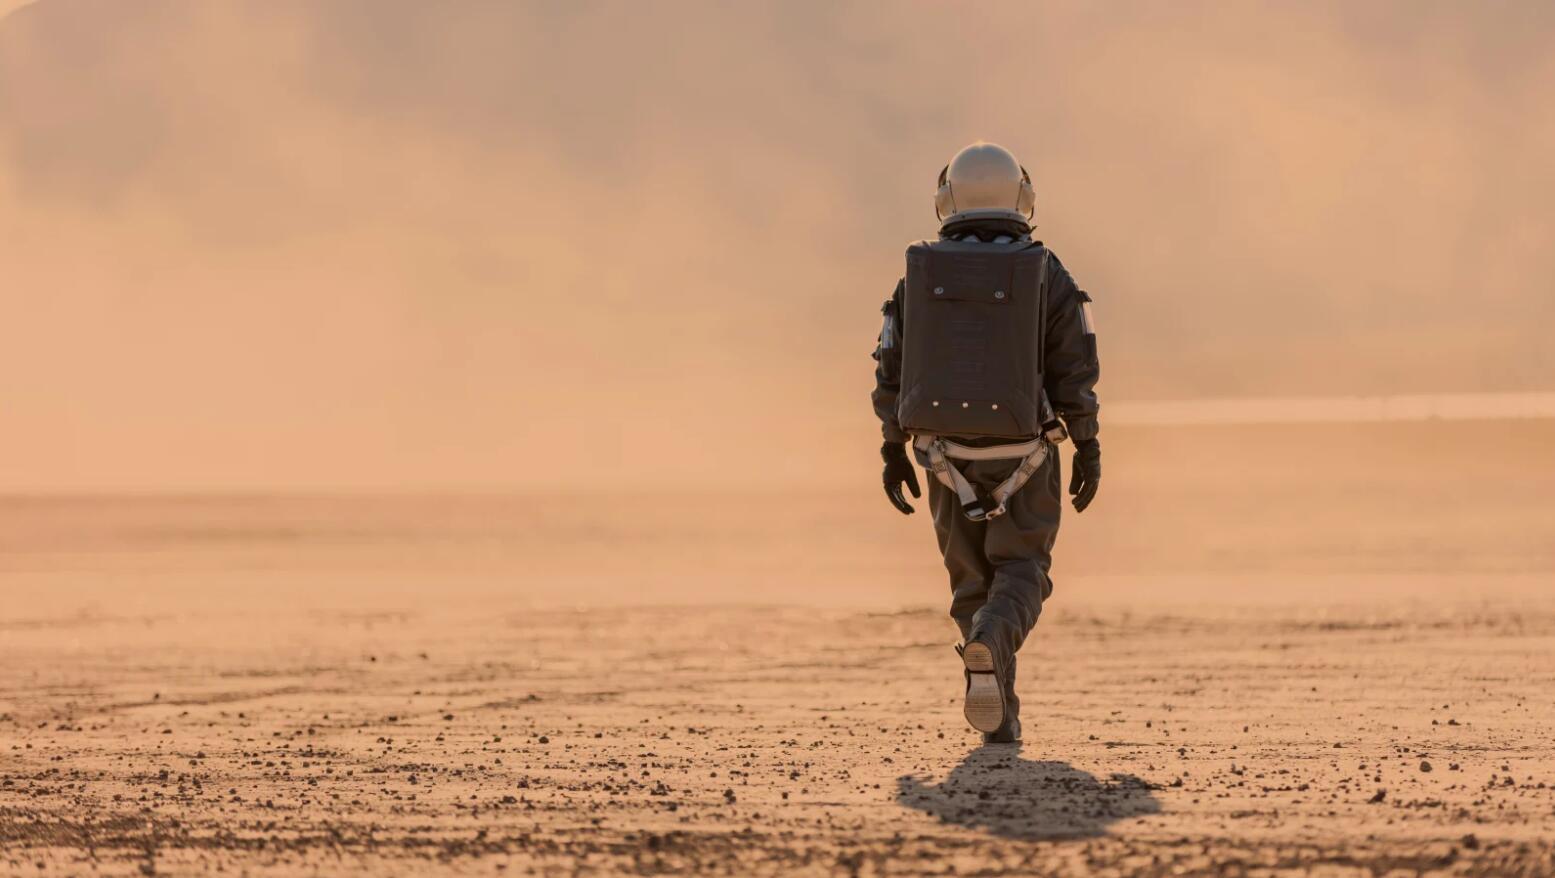 NASA招聘隔离达人 模拟火星生活8个月